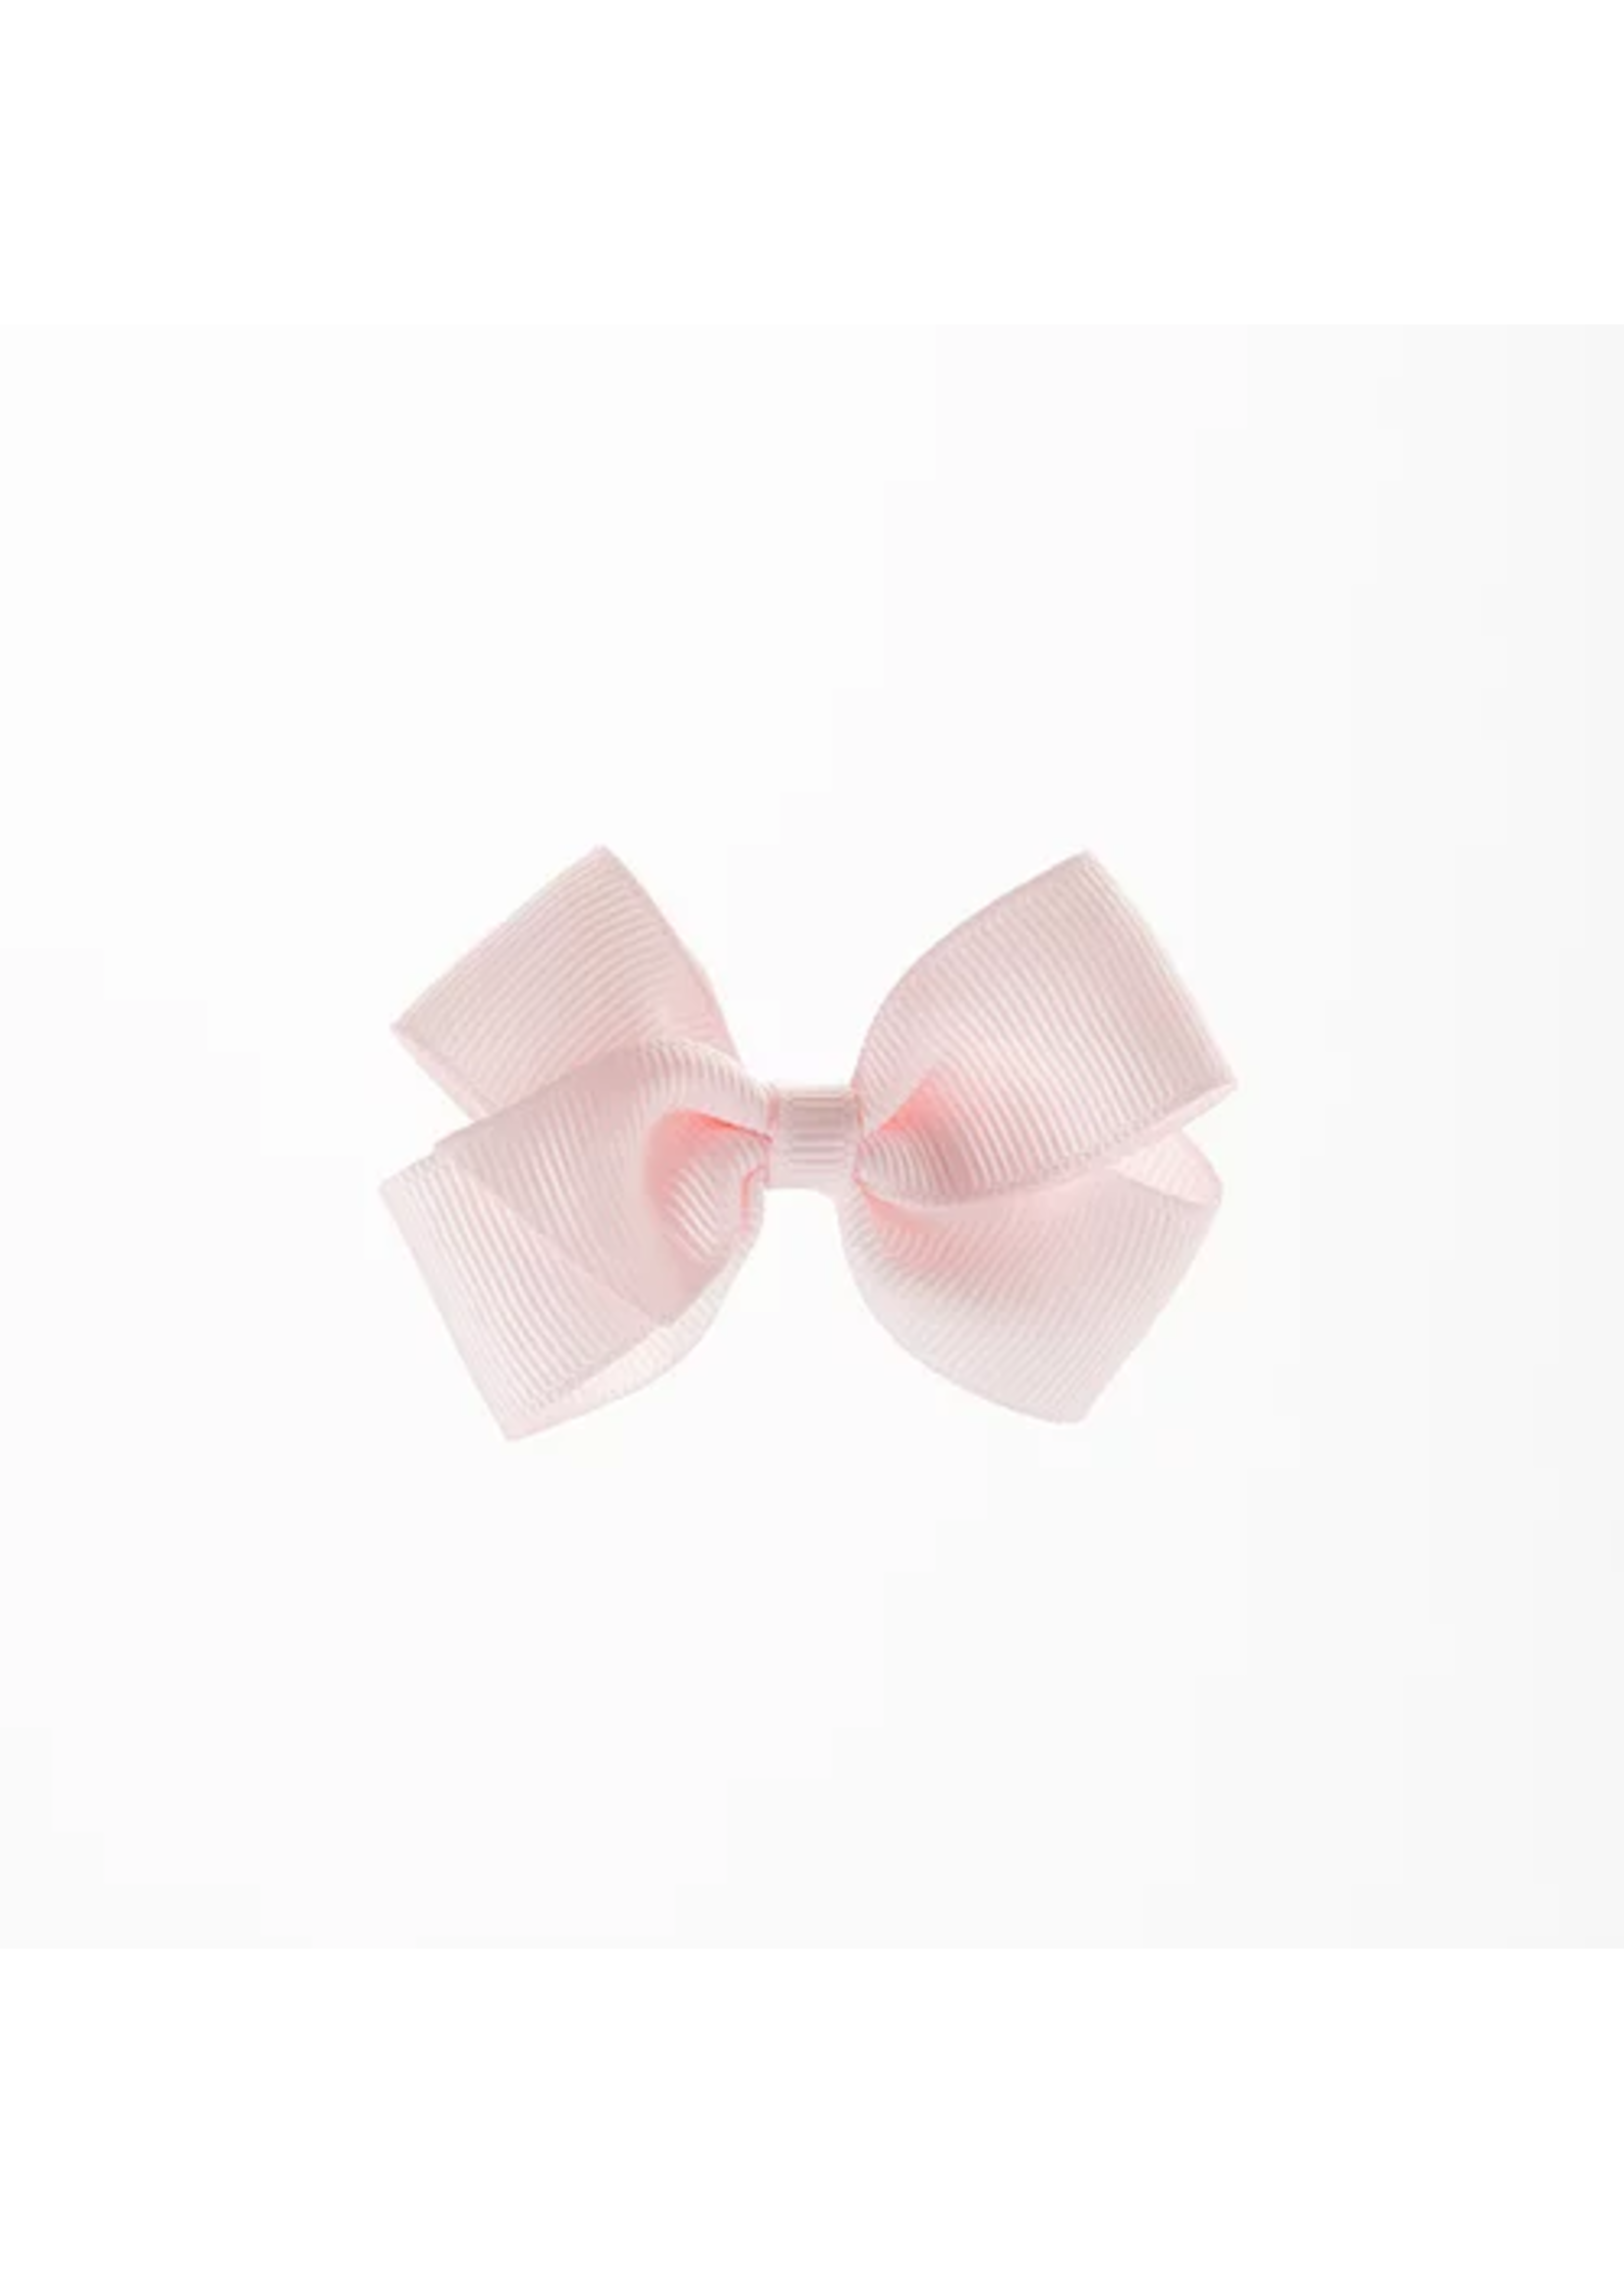 olilia Olilia Small London Bow (Powder Pink)